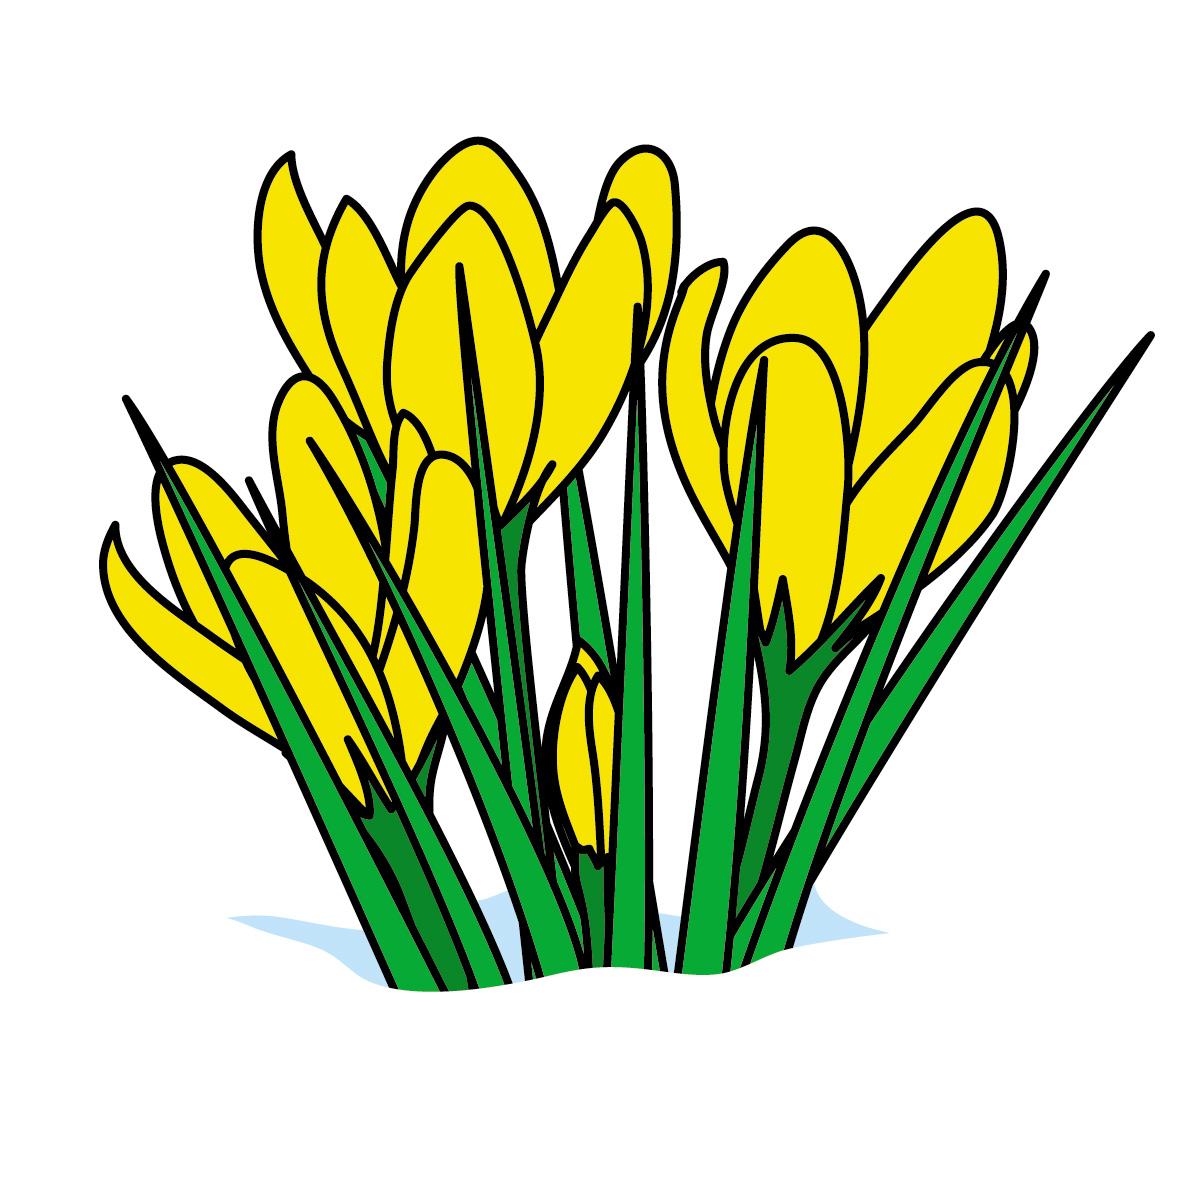 Daffodil Clipart - clipartall; Daffodil Clipart - clipartall; Daffodils Clipart | Free Download Clip Art | Free Clip Art | on .